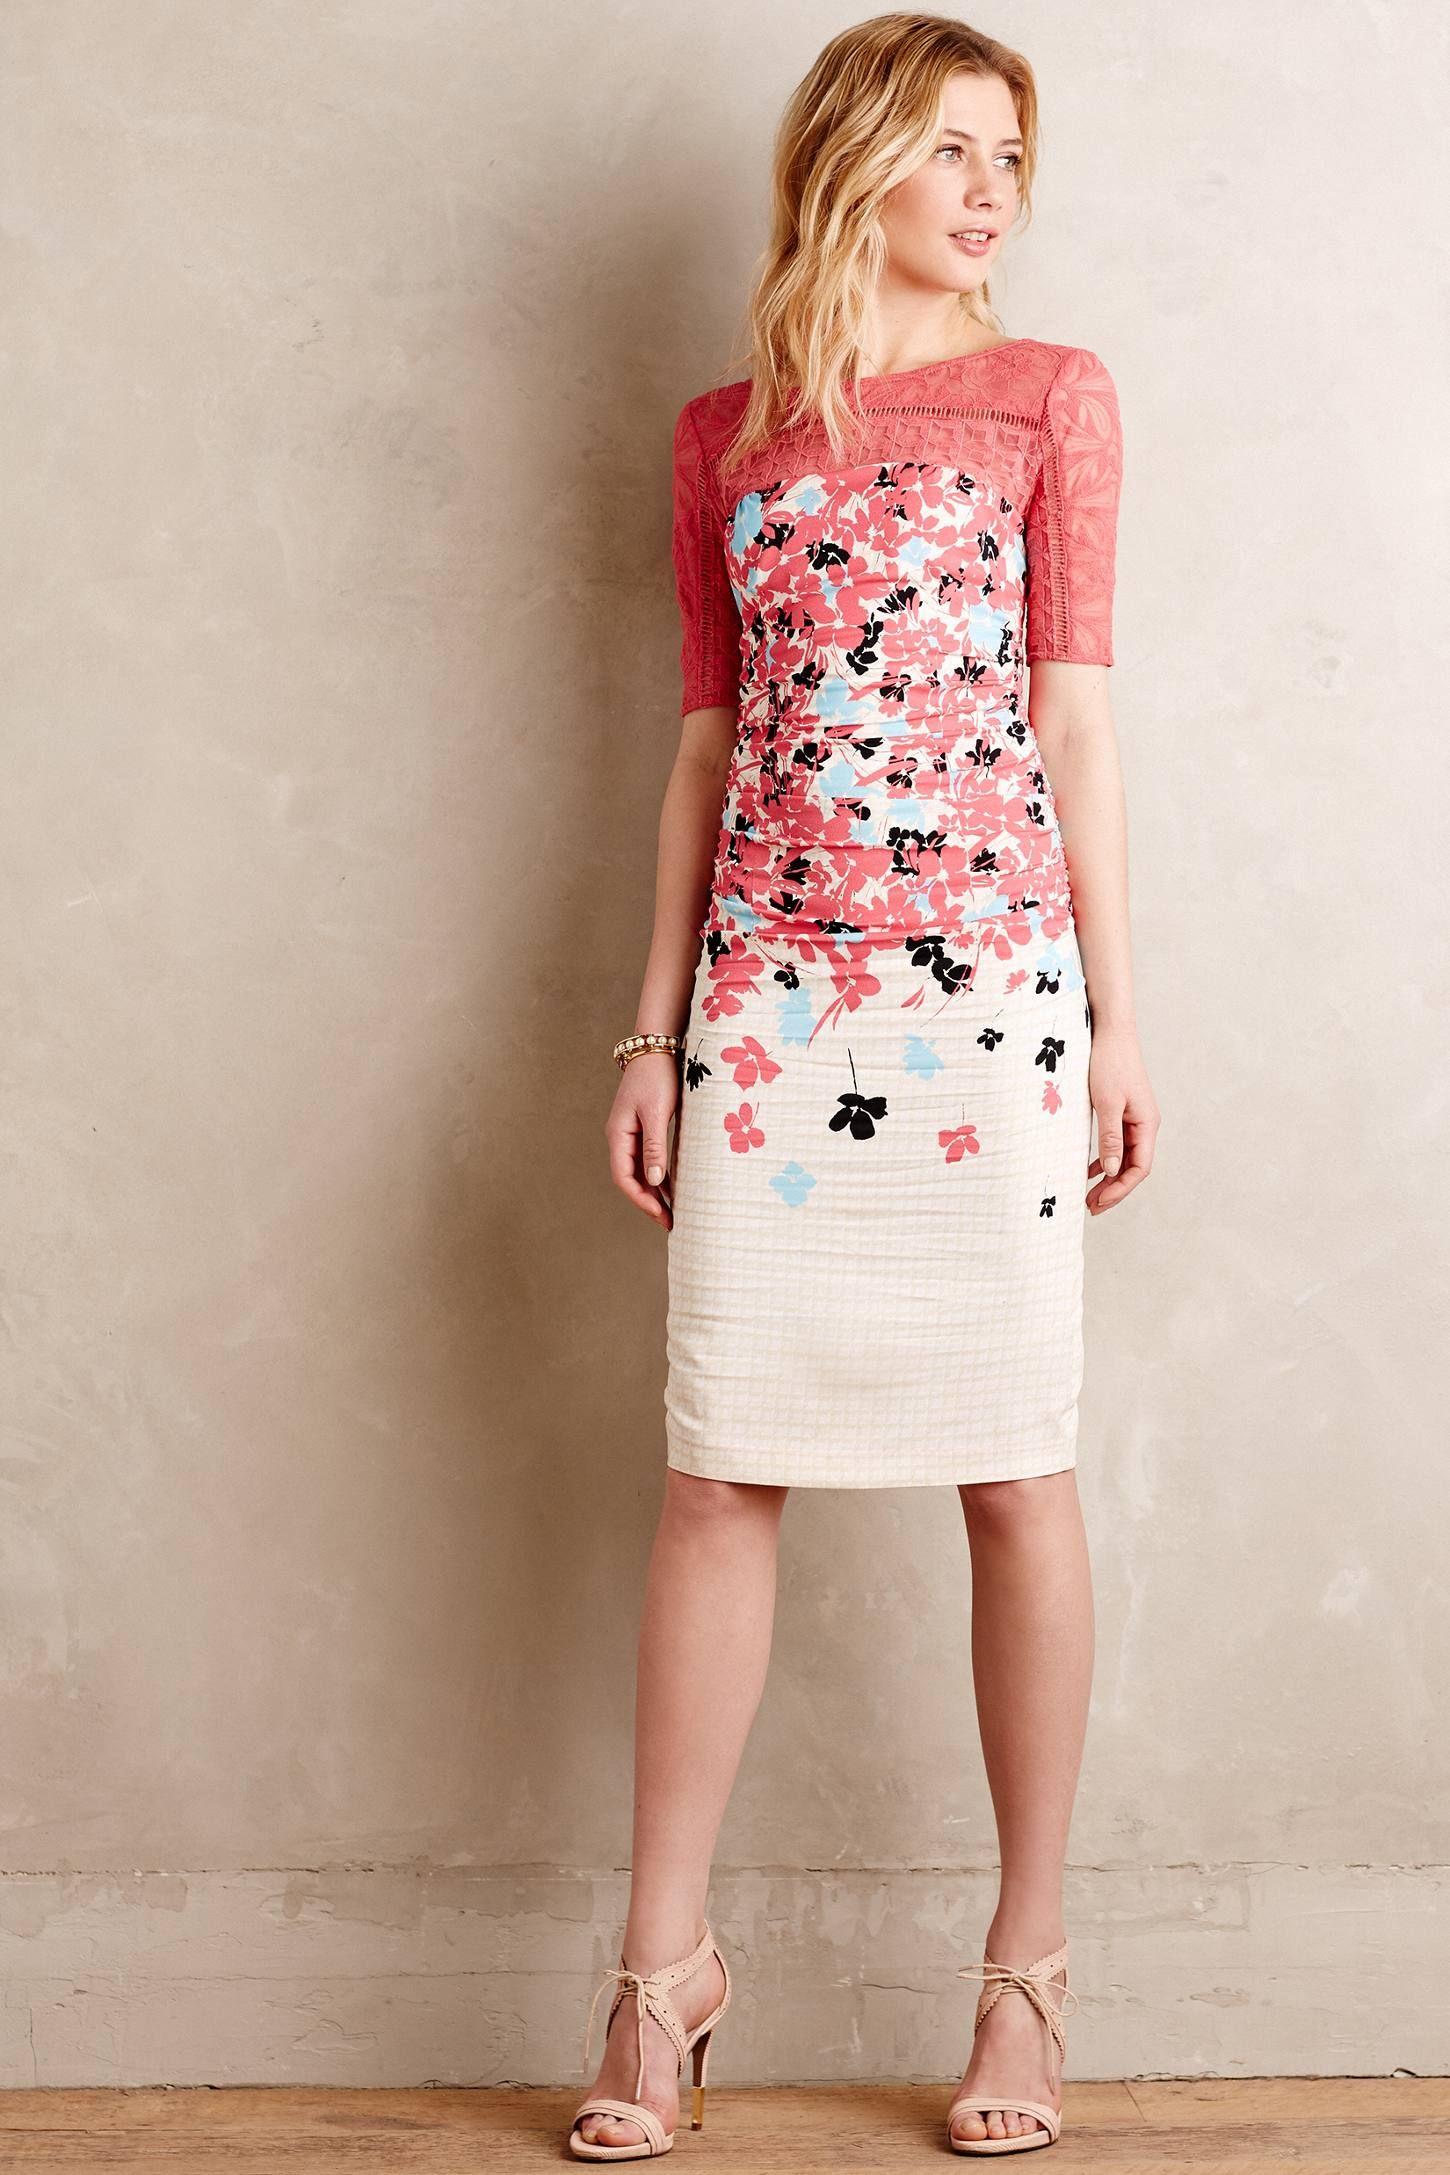 Bloomfall Petite Dress - anthropologie.com Stunning   FASHION, HAIR ...